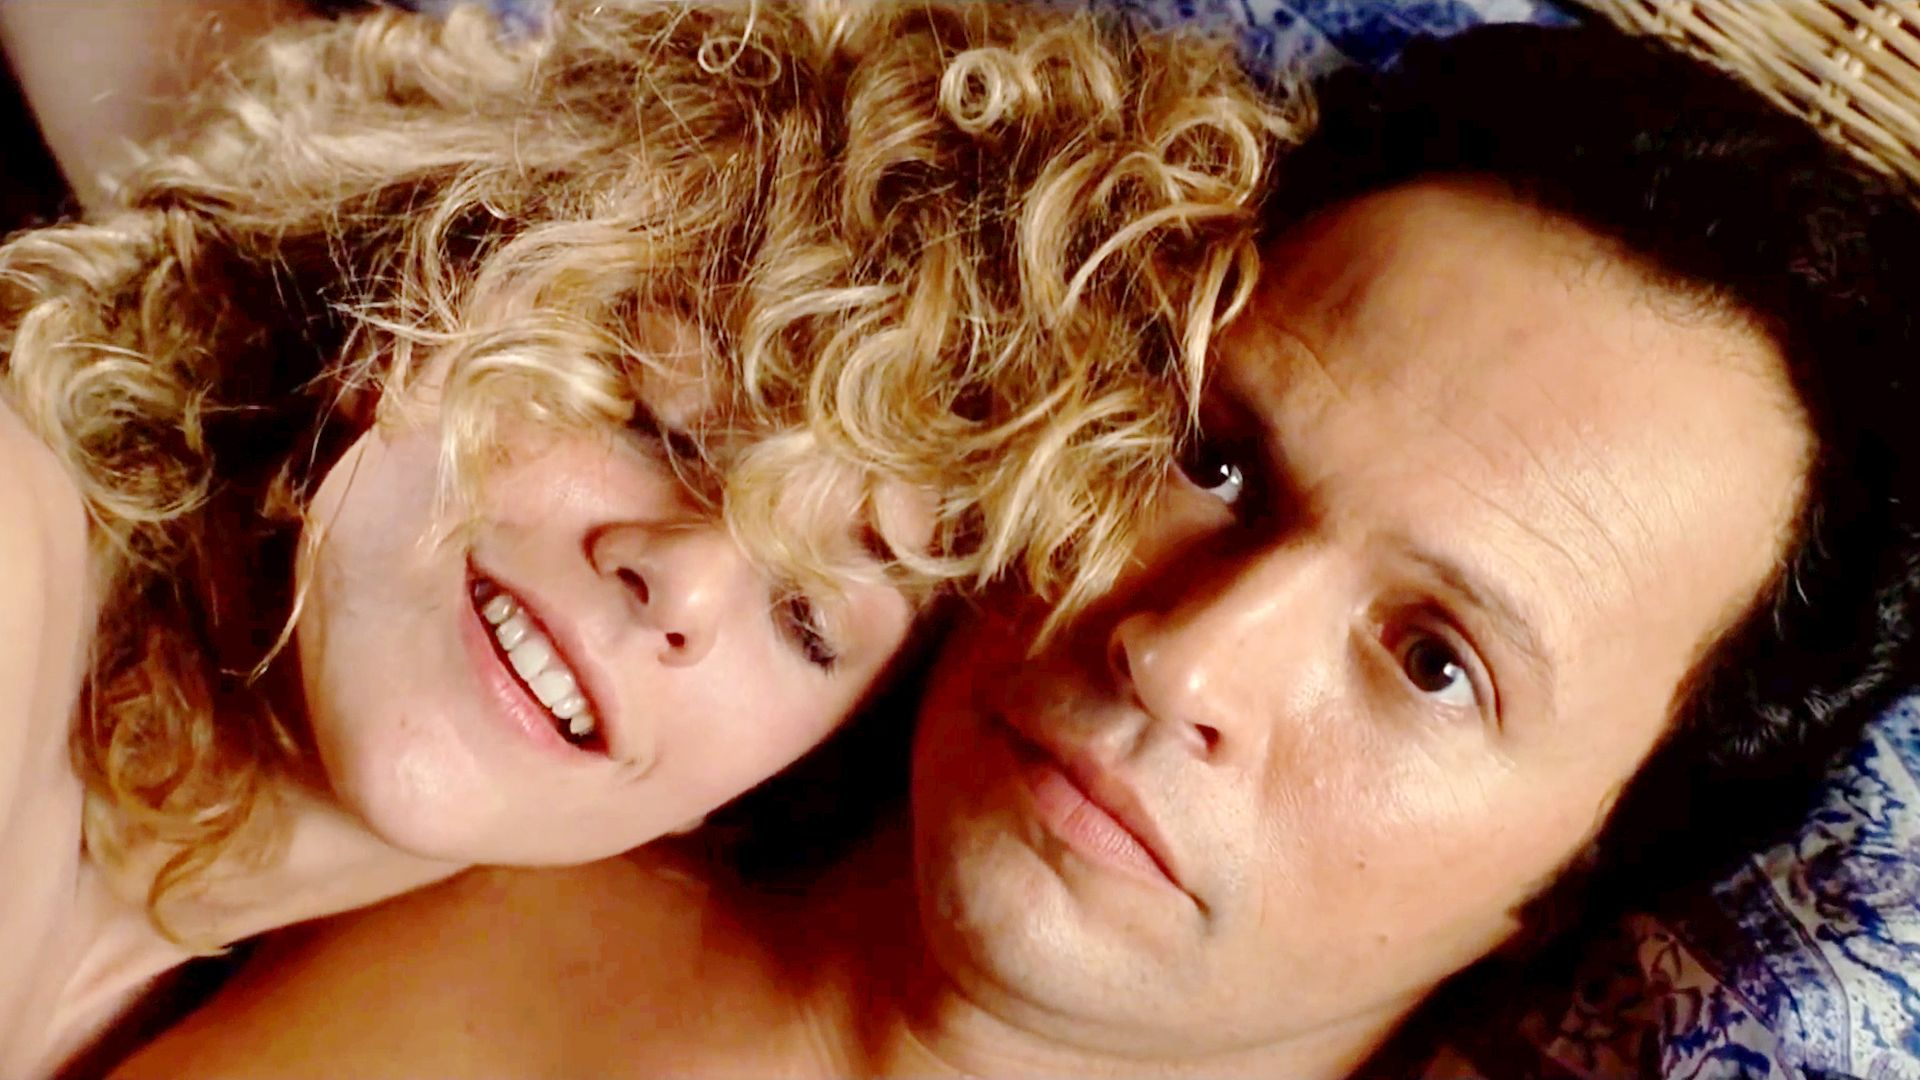 Best sexual romantic comedies